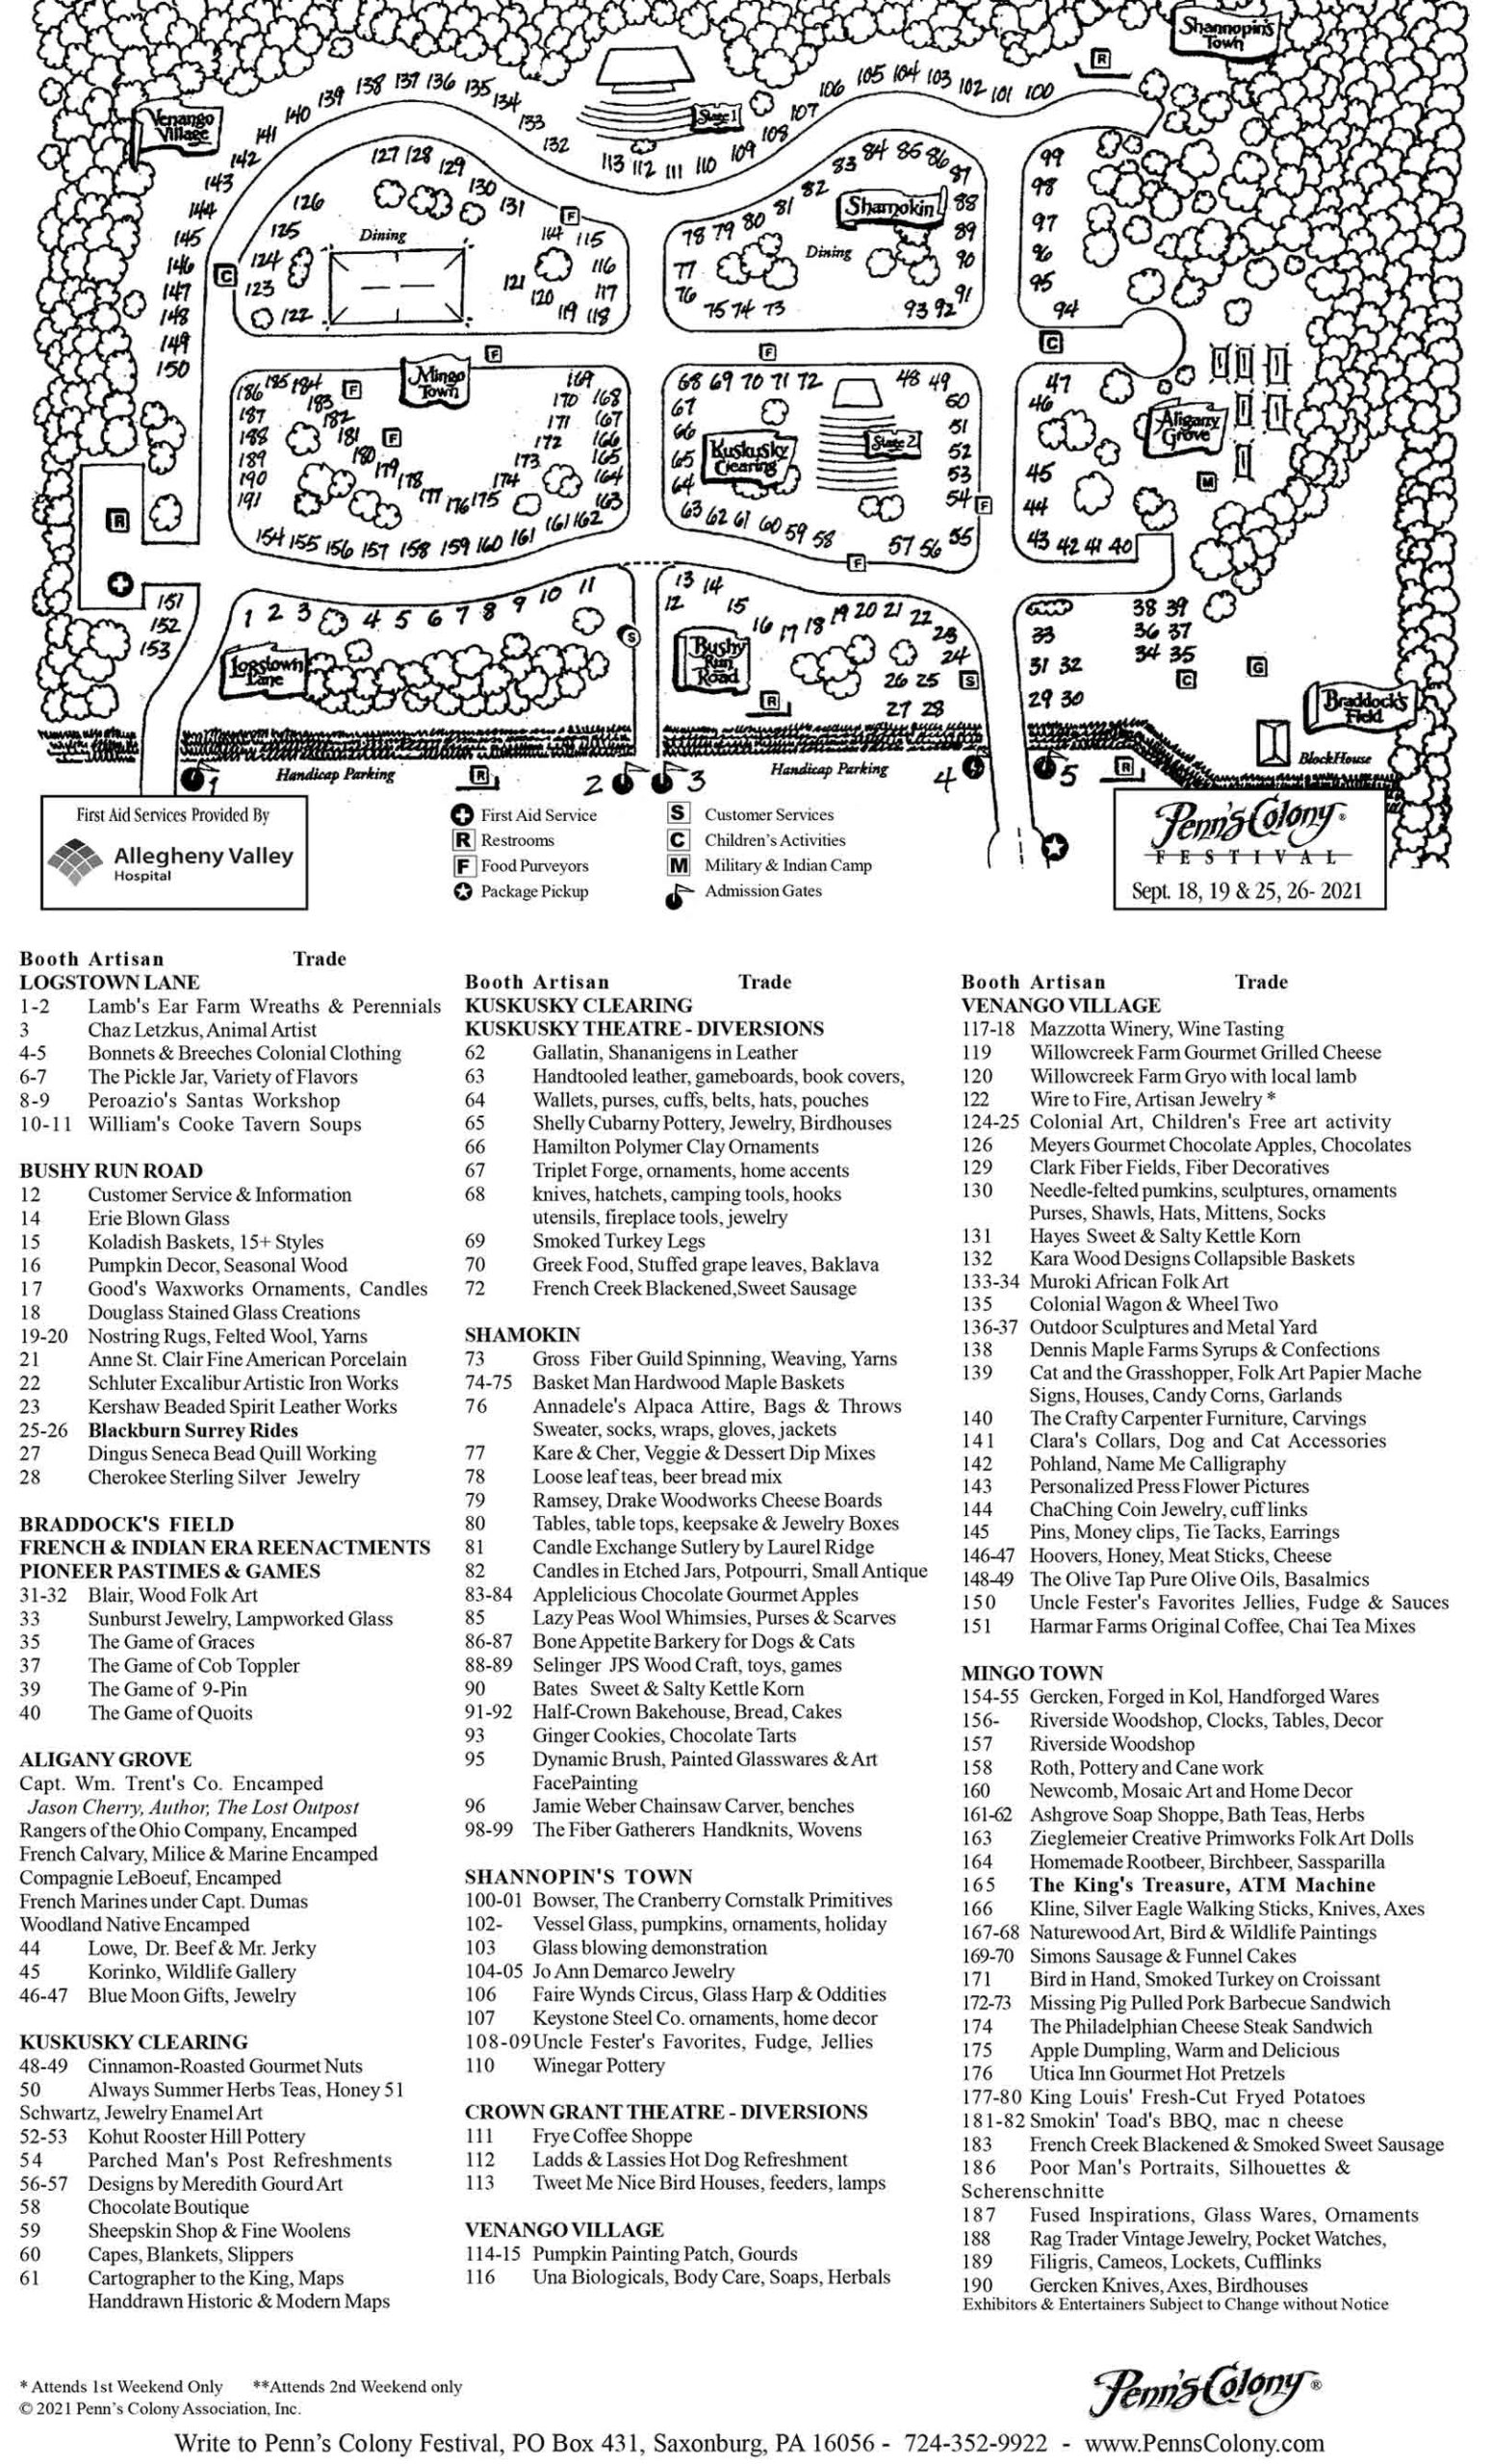 Penns' Colony 2021 Show Program Exhibitors map